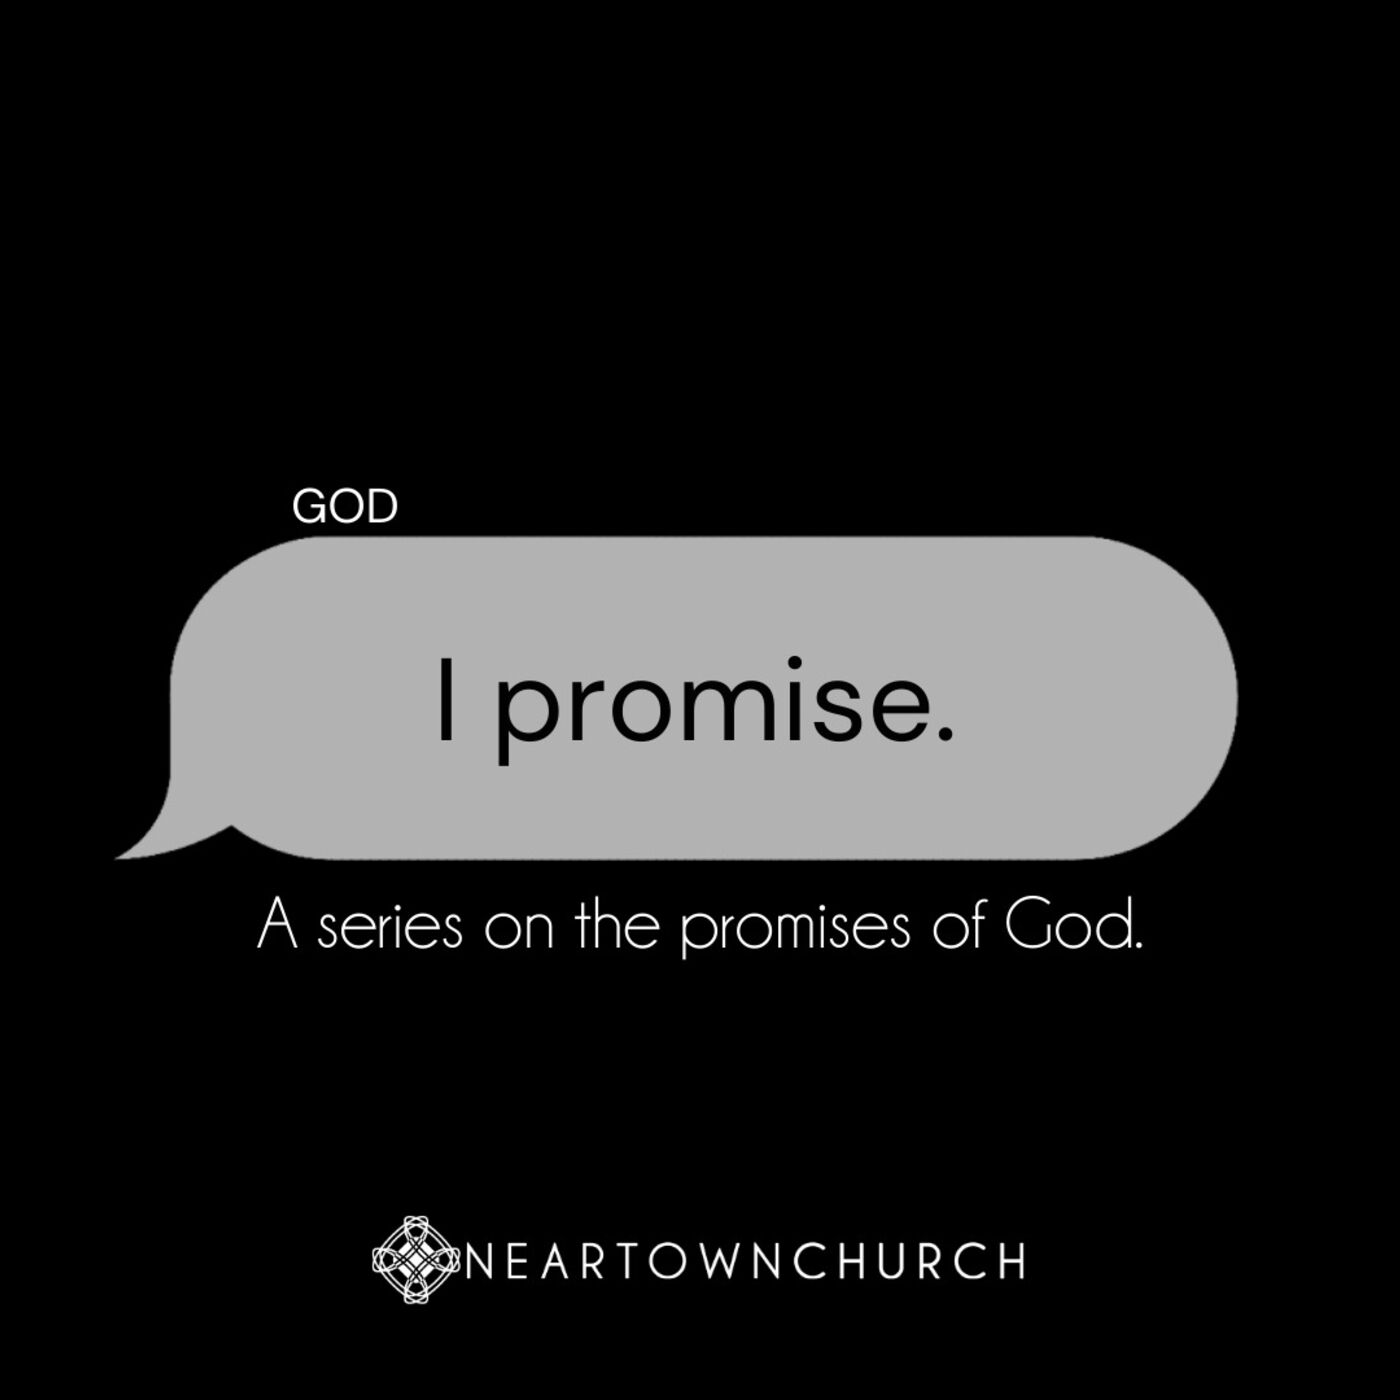 I promise. - 8.30.2020